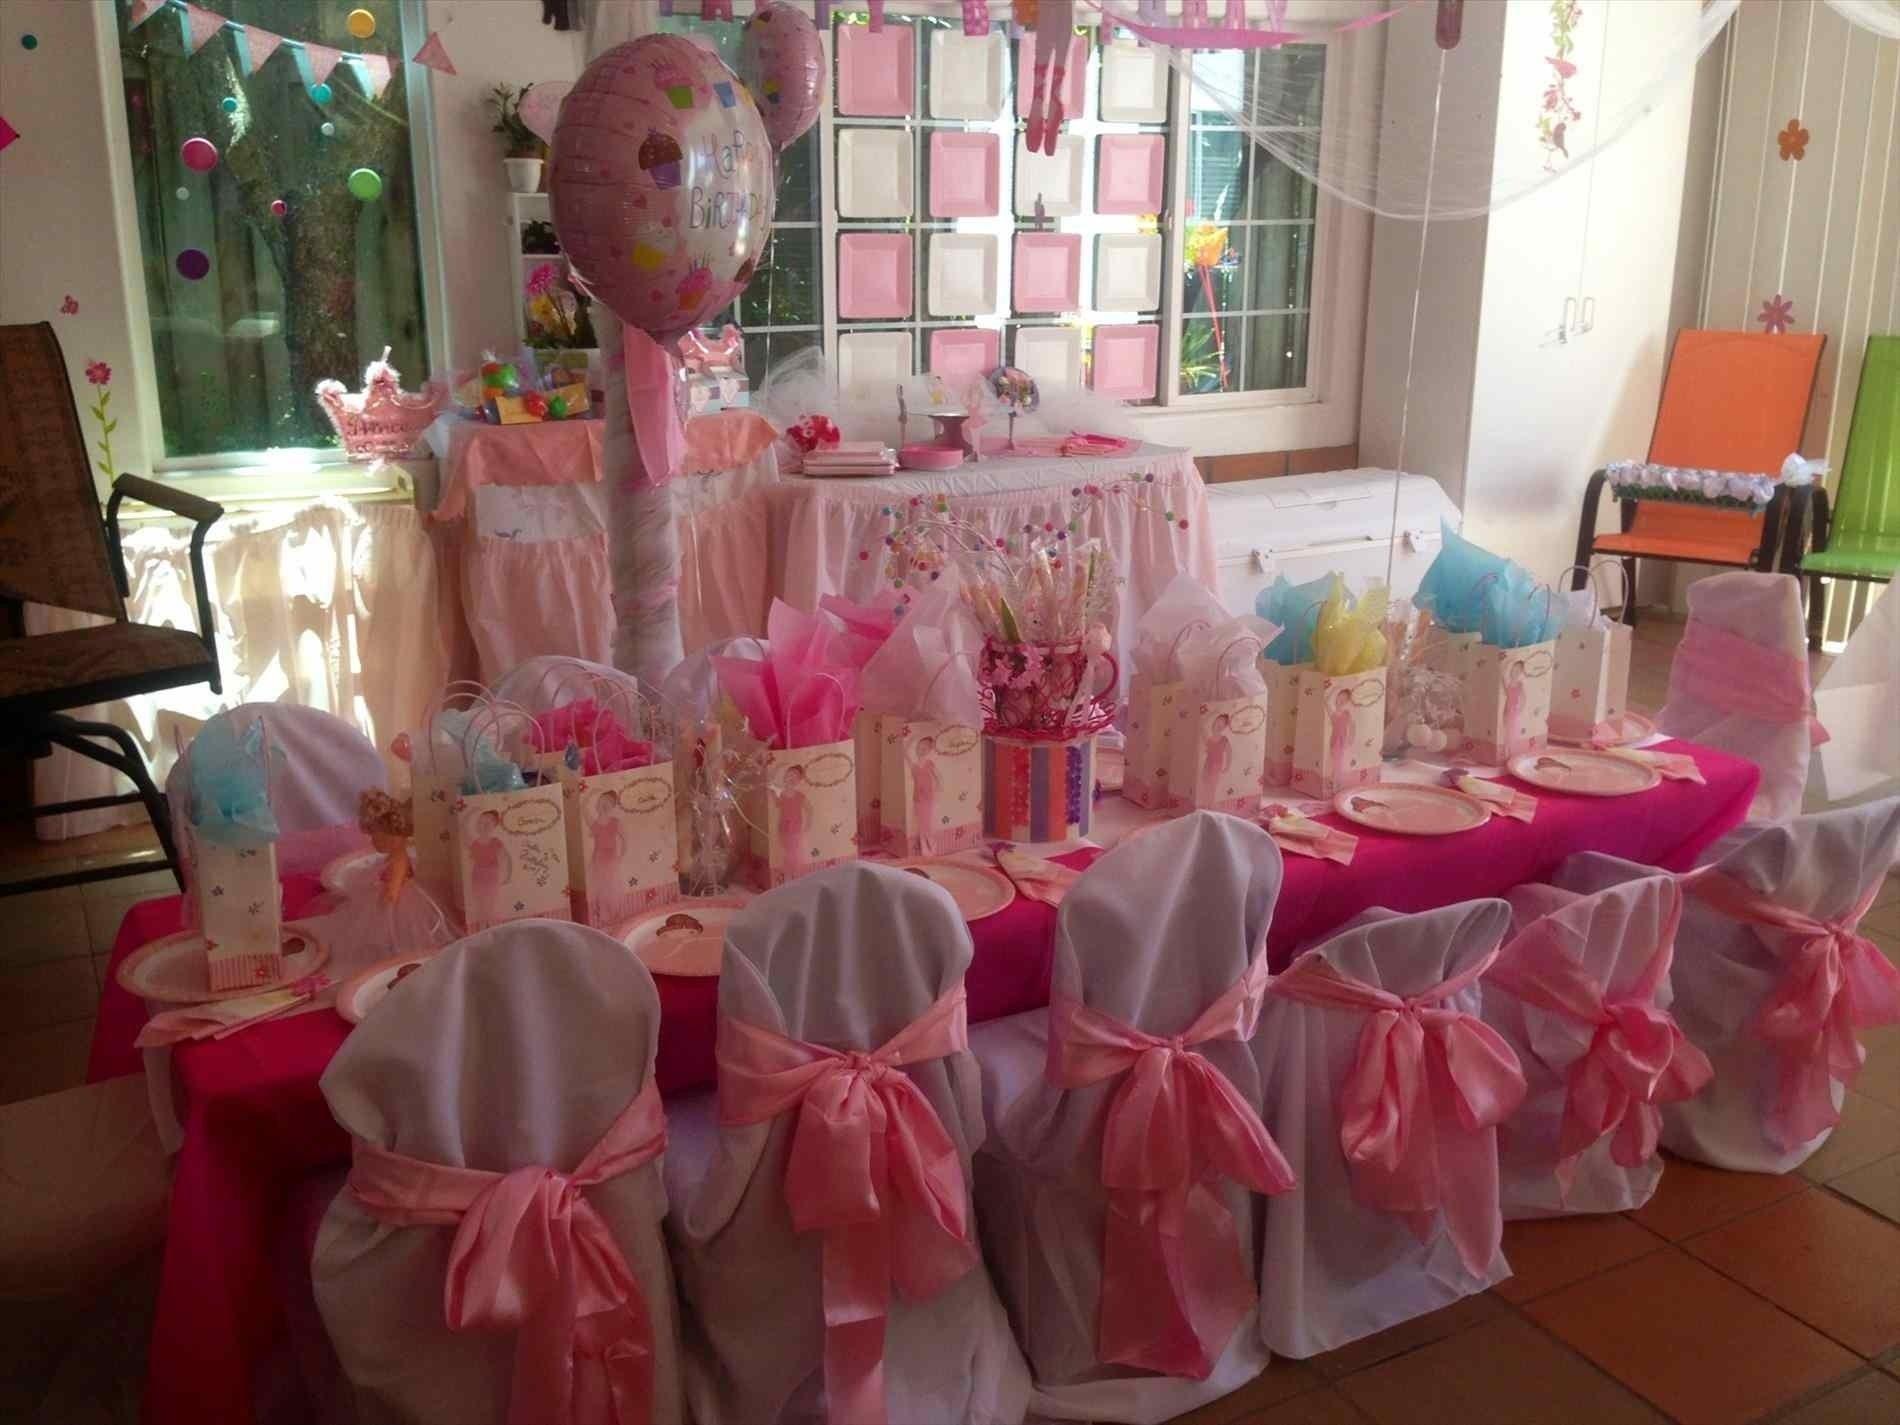 10 Spectacular Little Girls Tea Party Ideas good tea party ideas for little girls at home how to host 2 2021